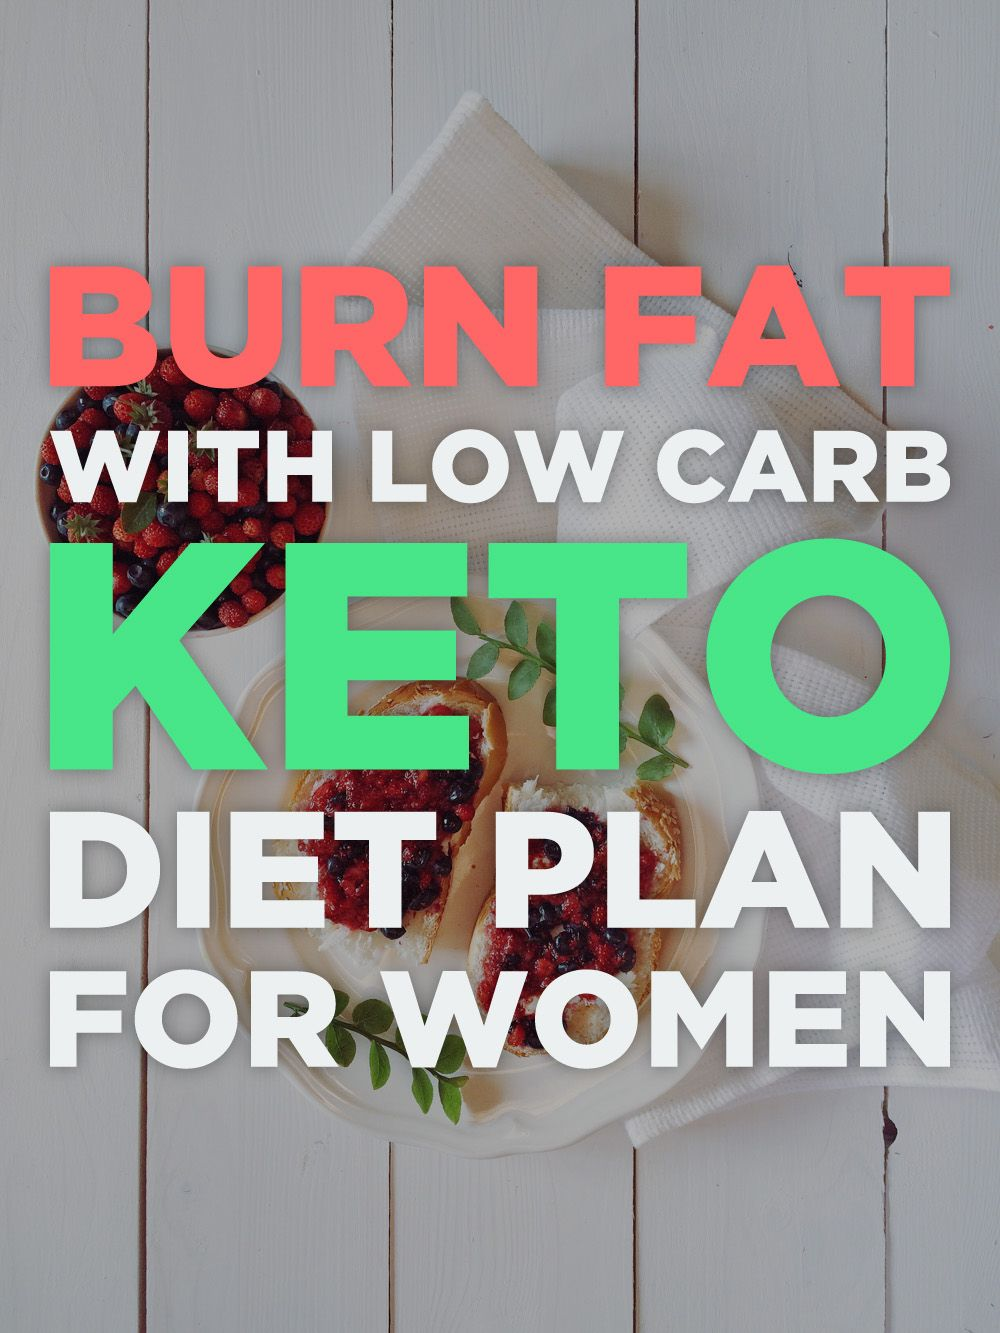 Burn Fat, keto vegetable recipes, mesomorph diet, keto diet cholesterol,